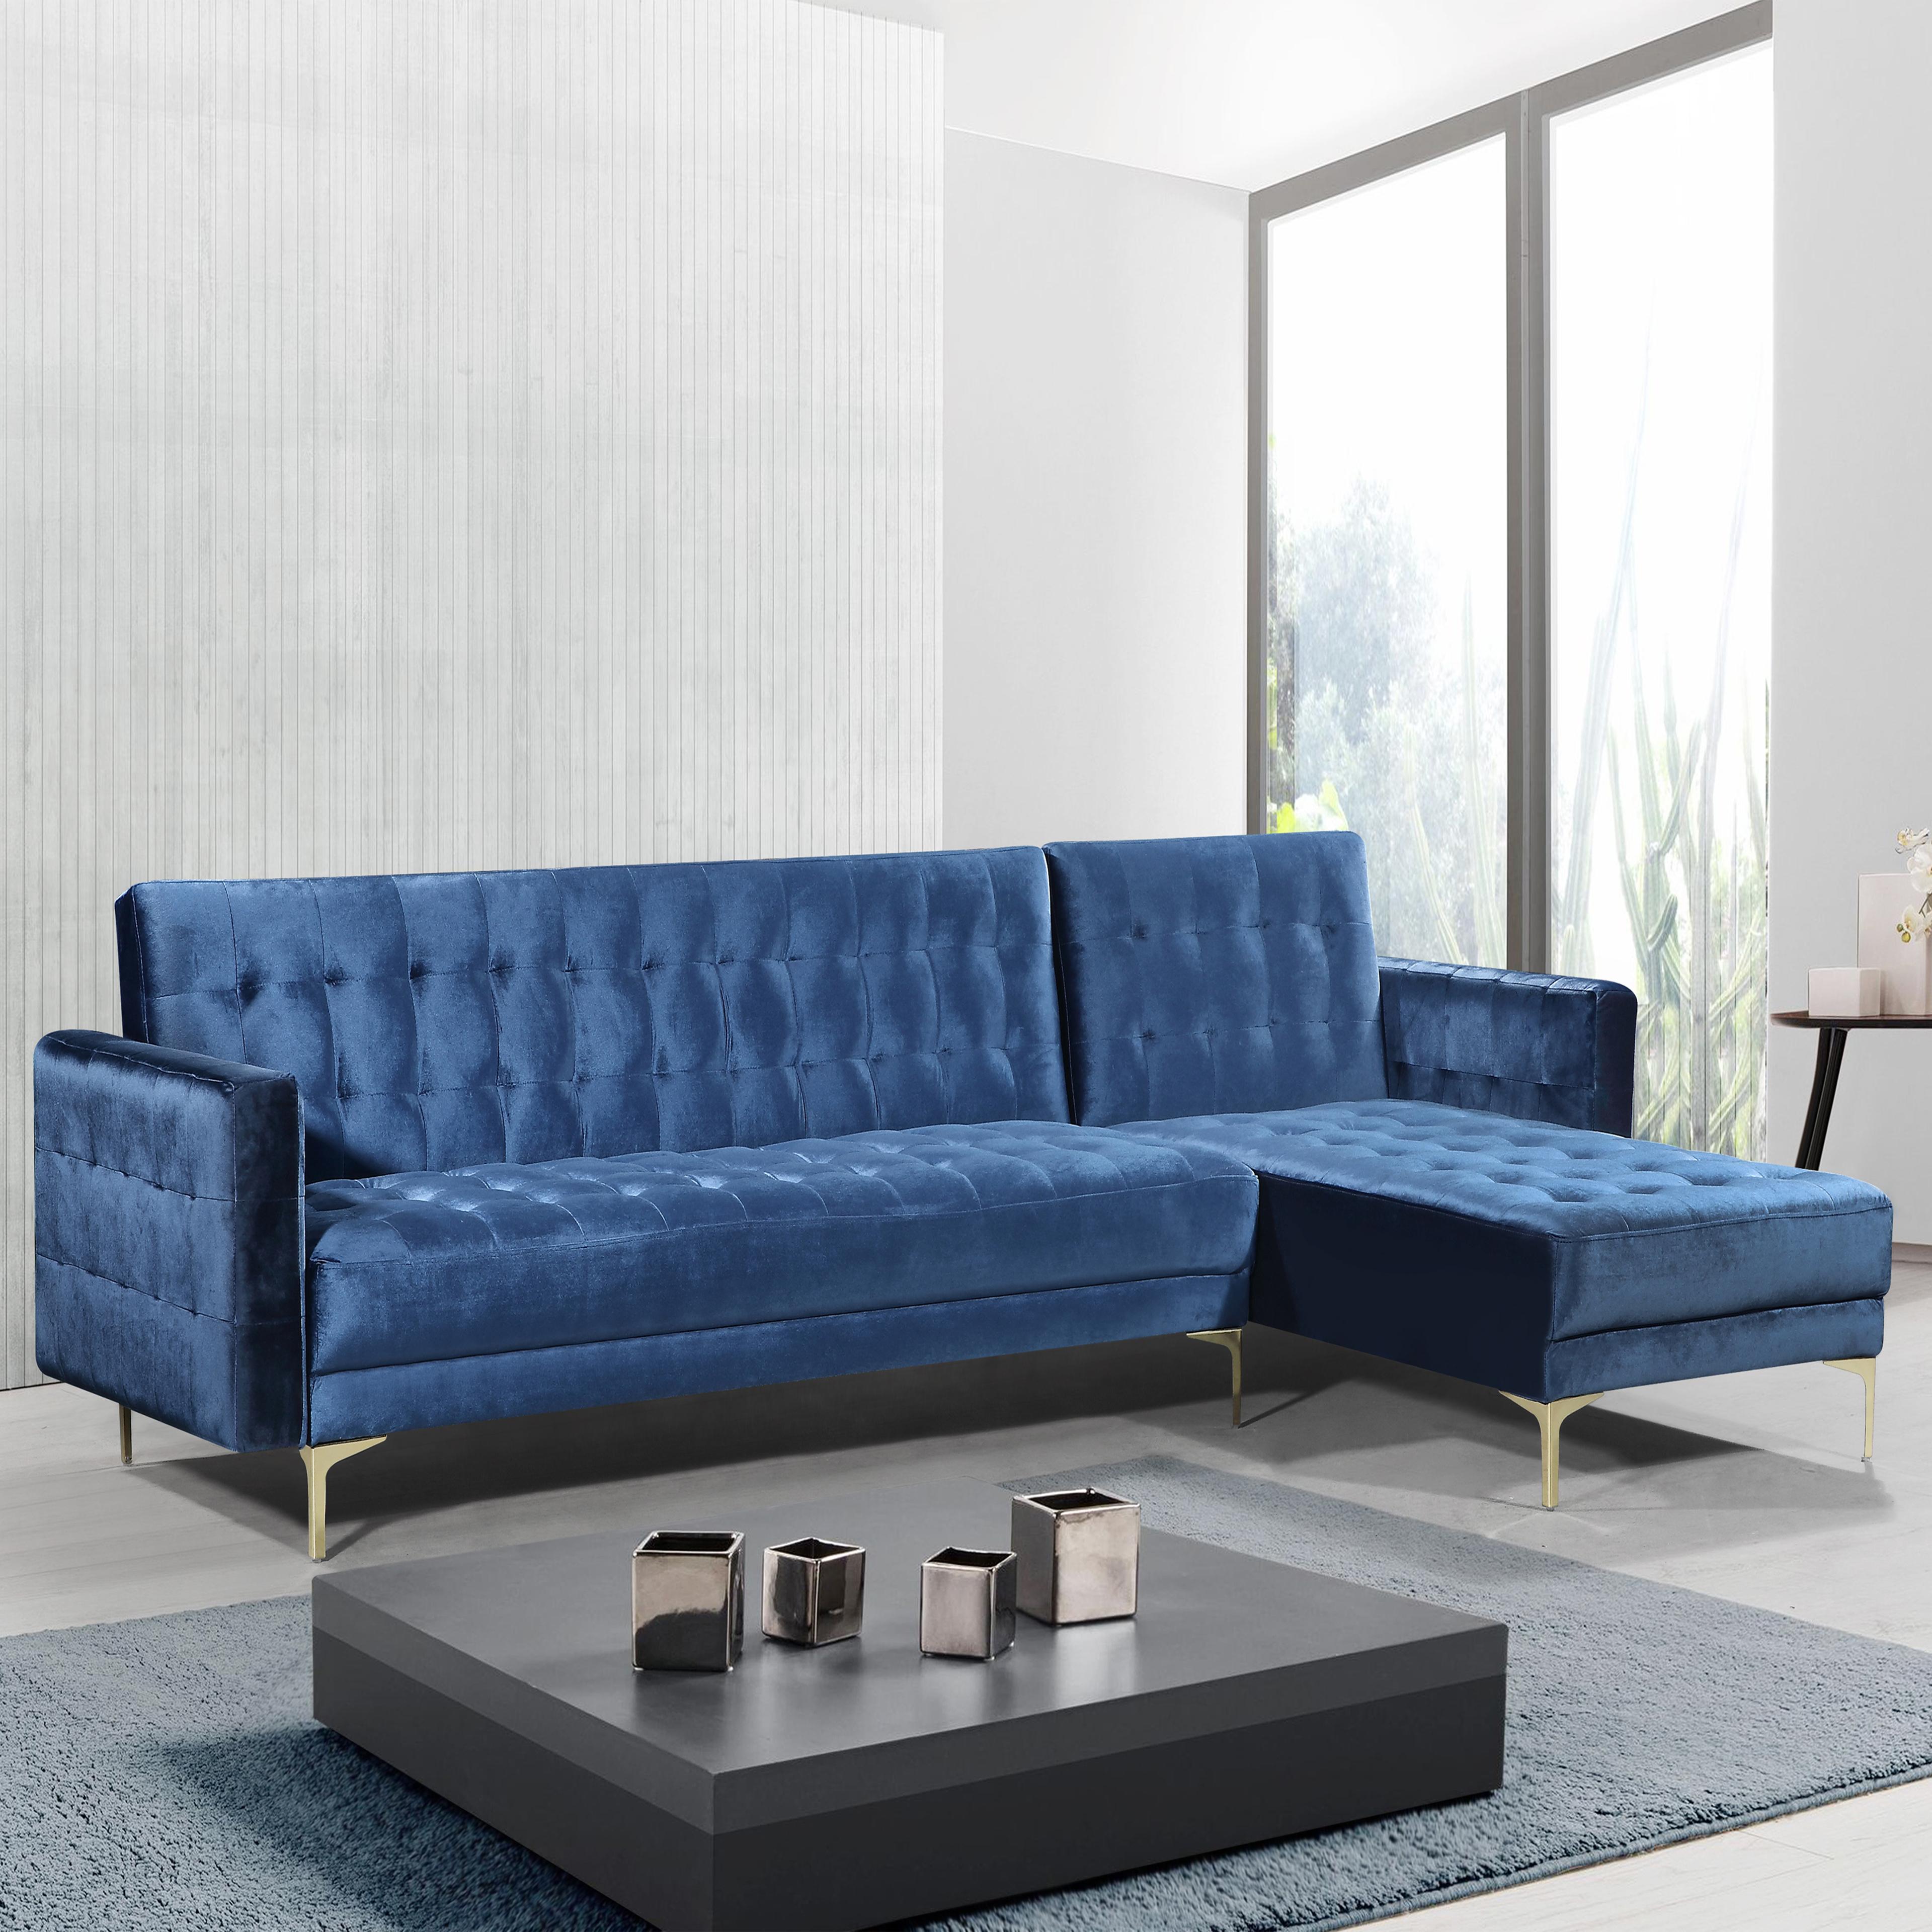 Right Facing Convertible Sectional Sofa Velvet Upholstered